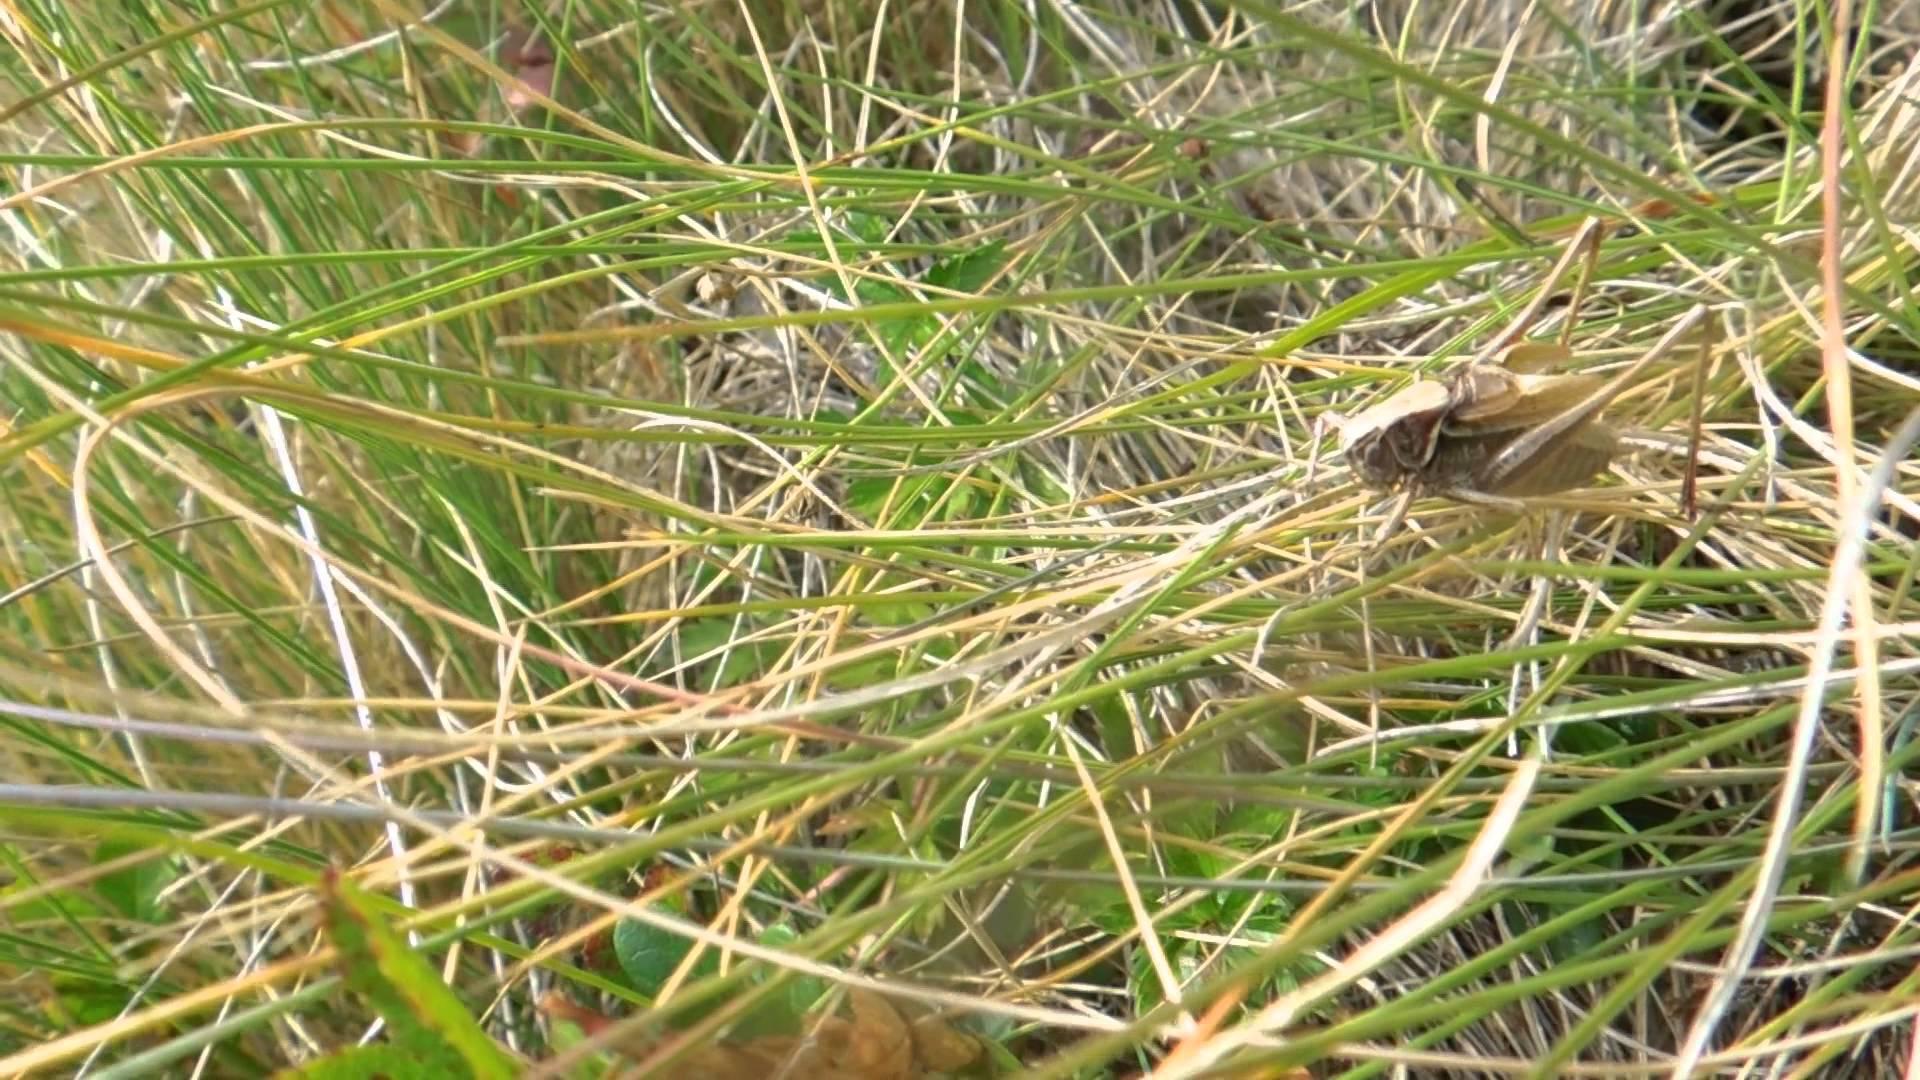 Metrioptera brachyptera 2013 8 23 Millstätter Alpe.